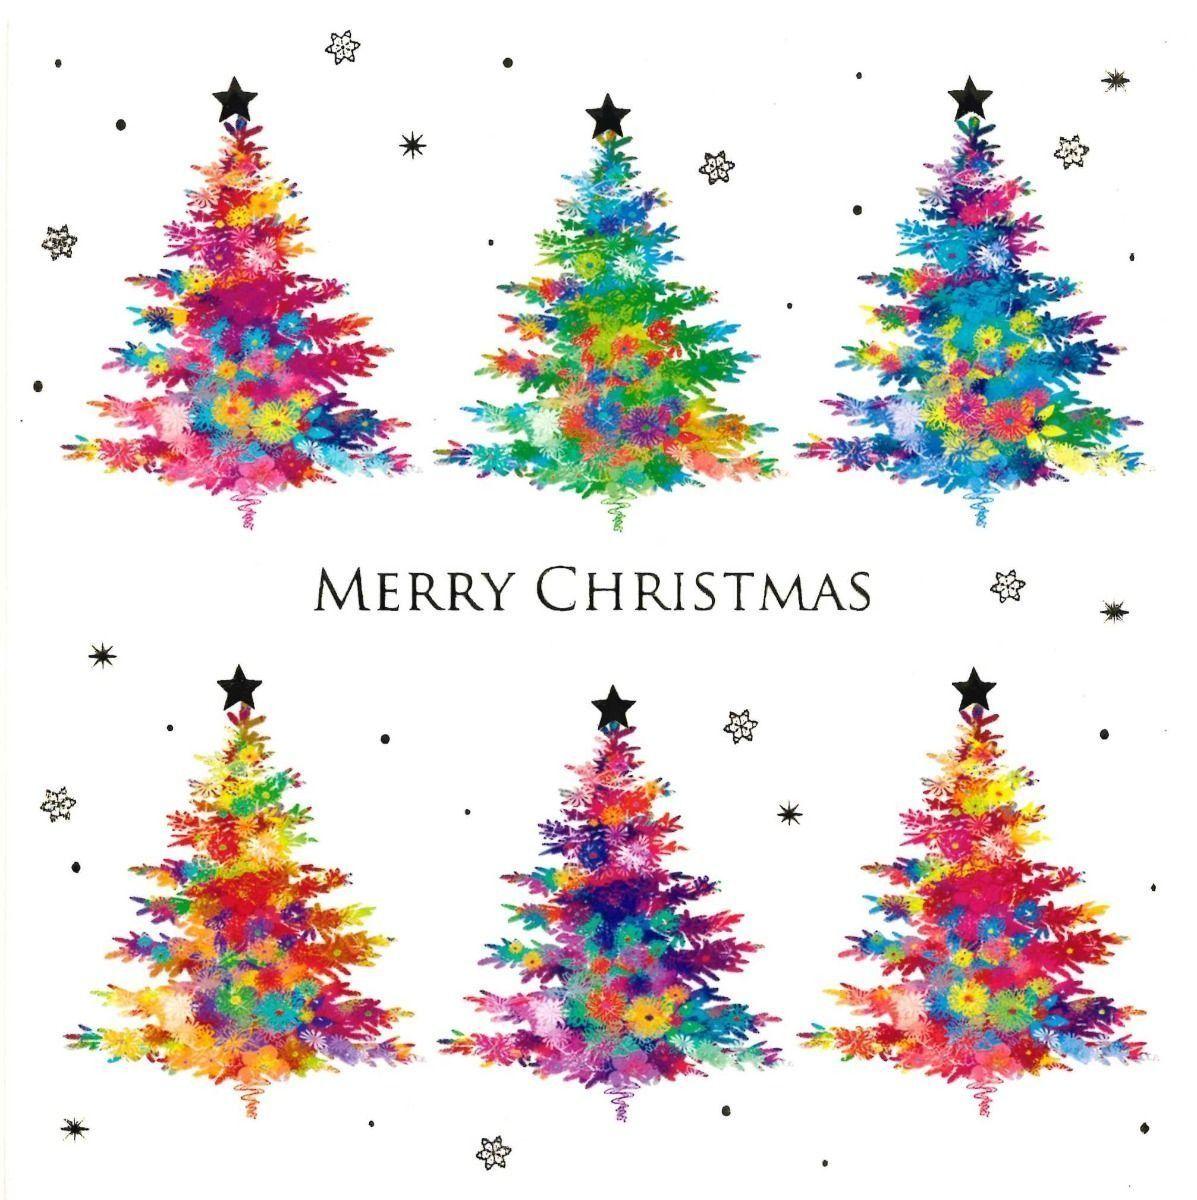 Christmas Cards Charity 2020 BHF Christmas cards, #BHF #Cards #Christmas #Christmascardsdiy